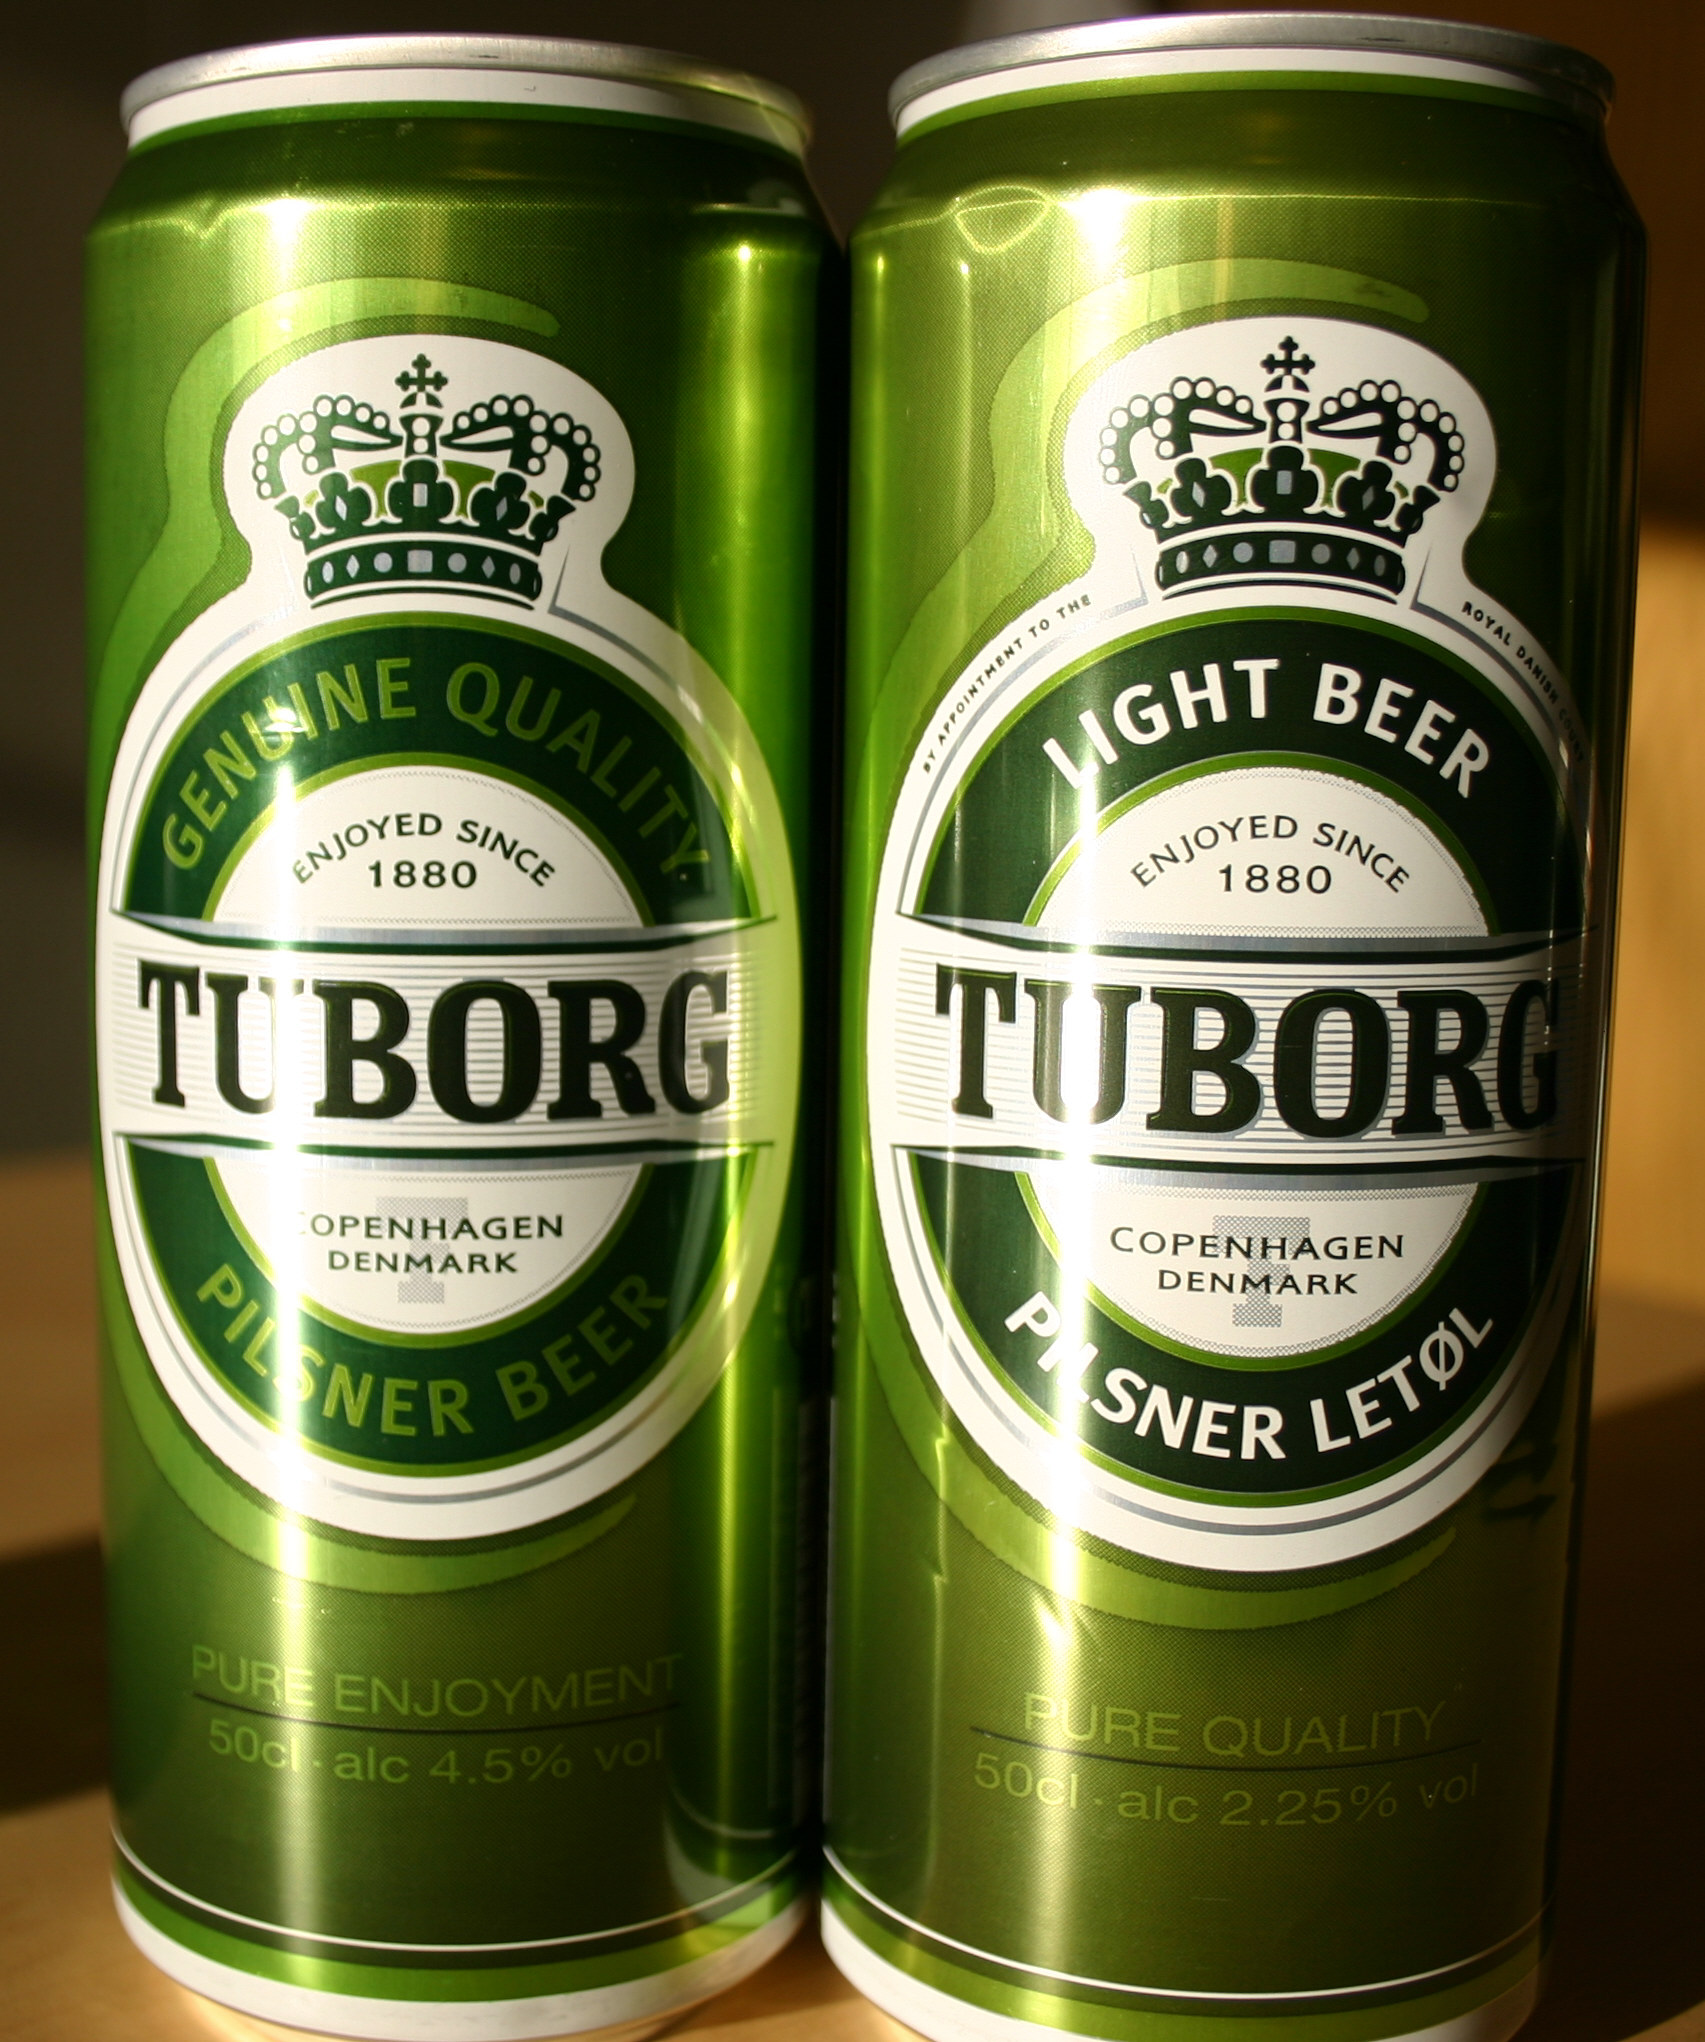 Tuborg Images